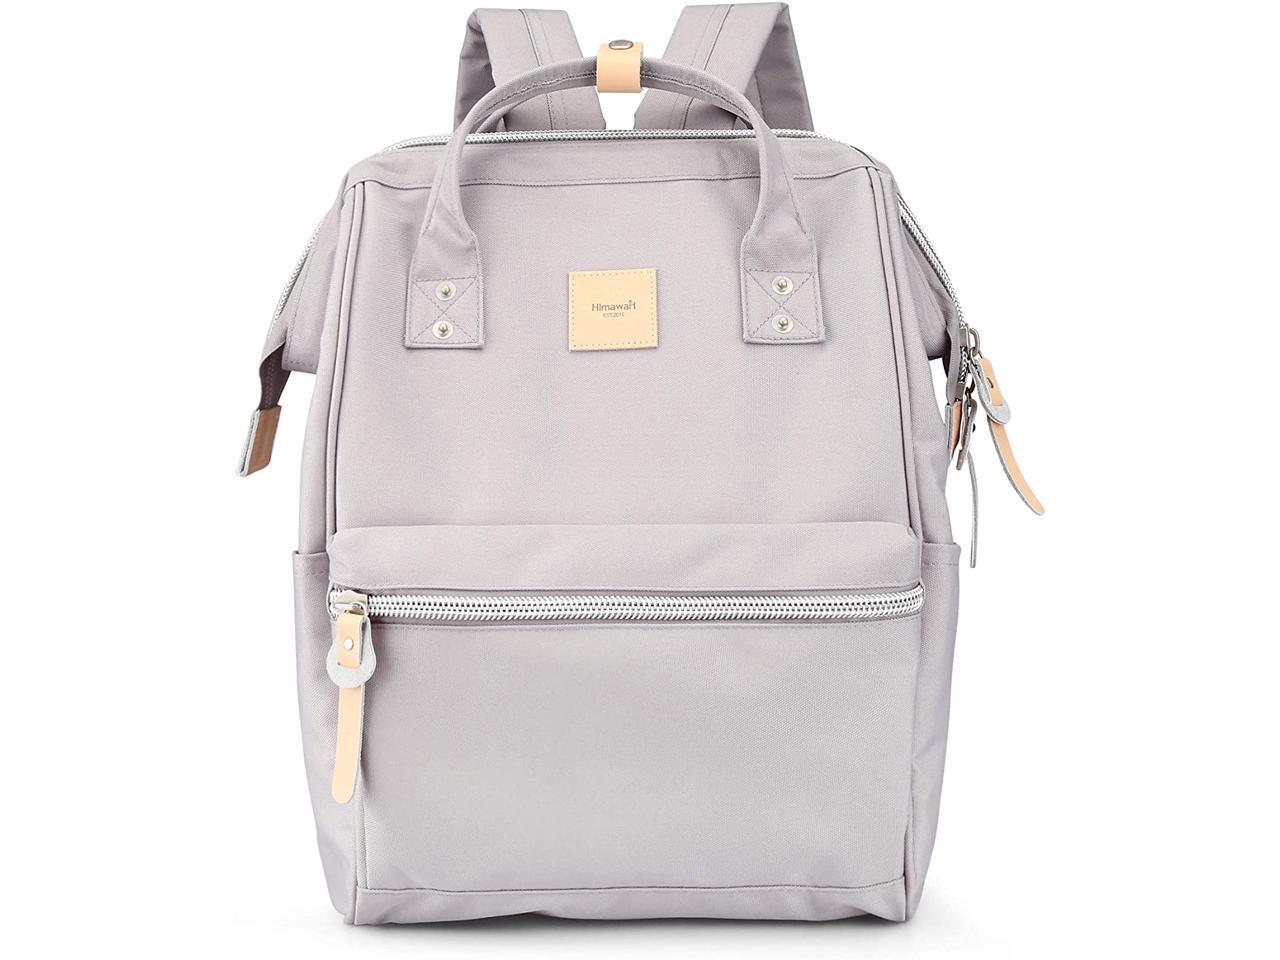 10 Best Backpacks For Teachers | Our Top Picks in 2021